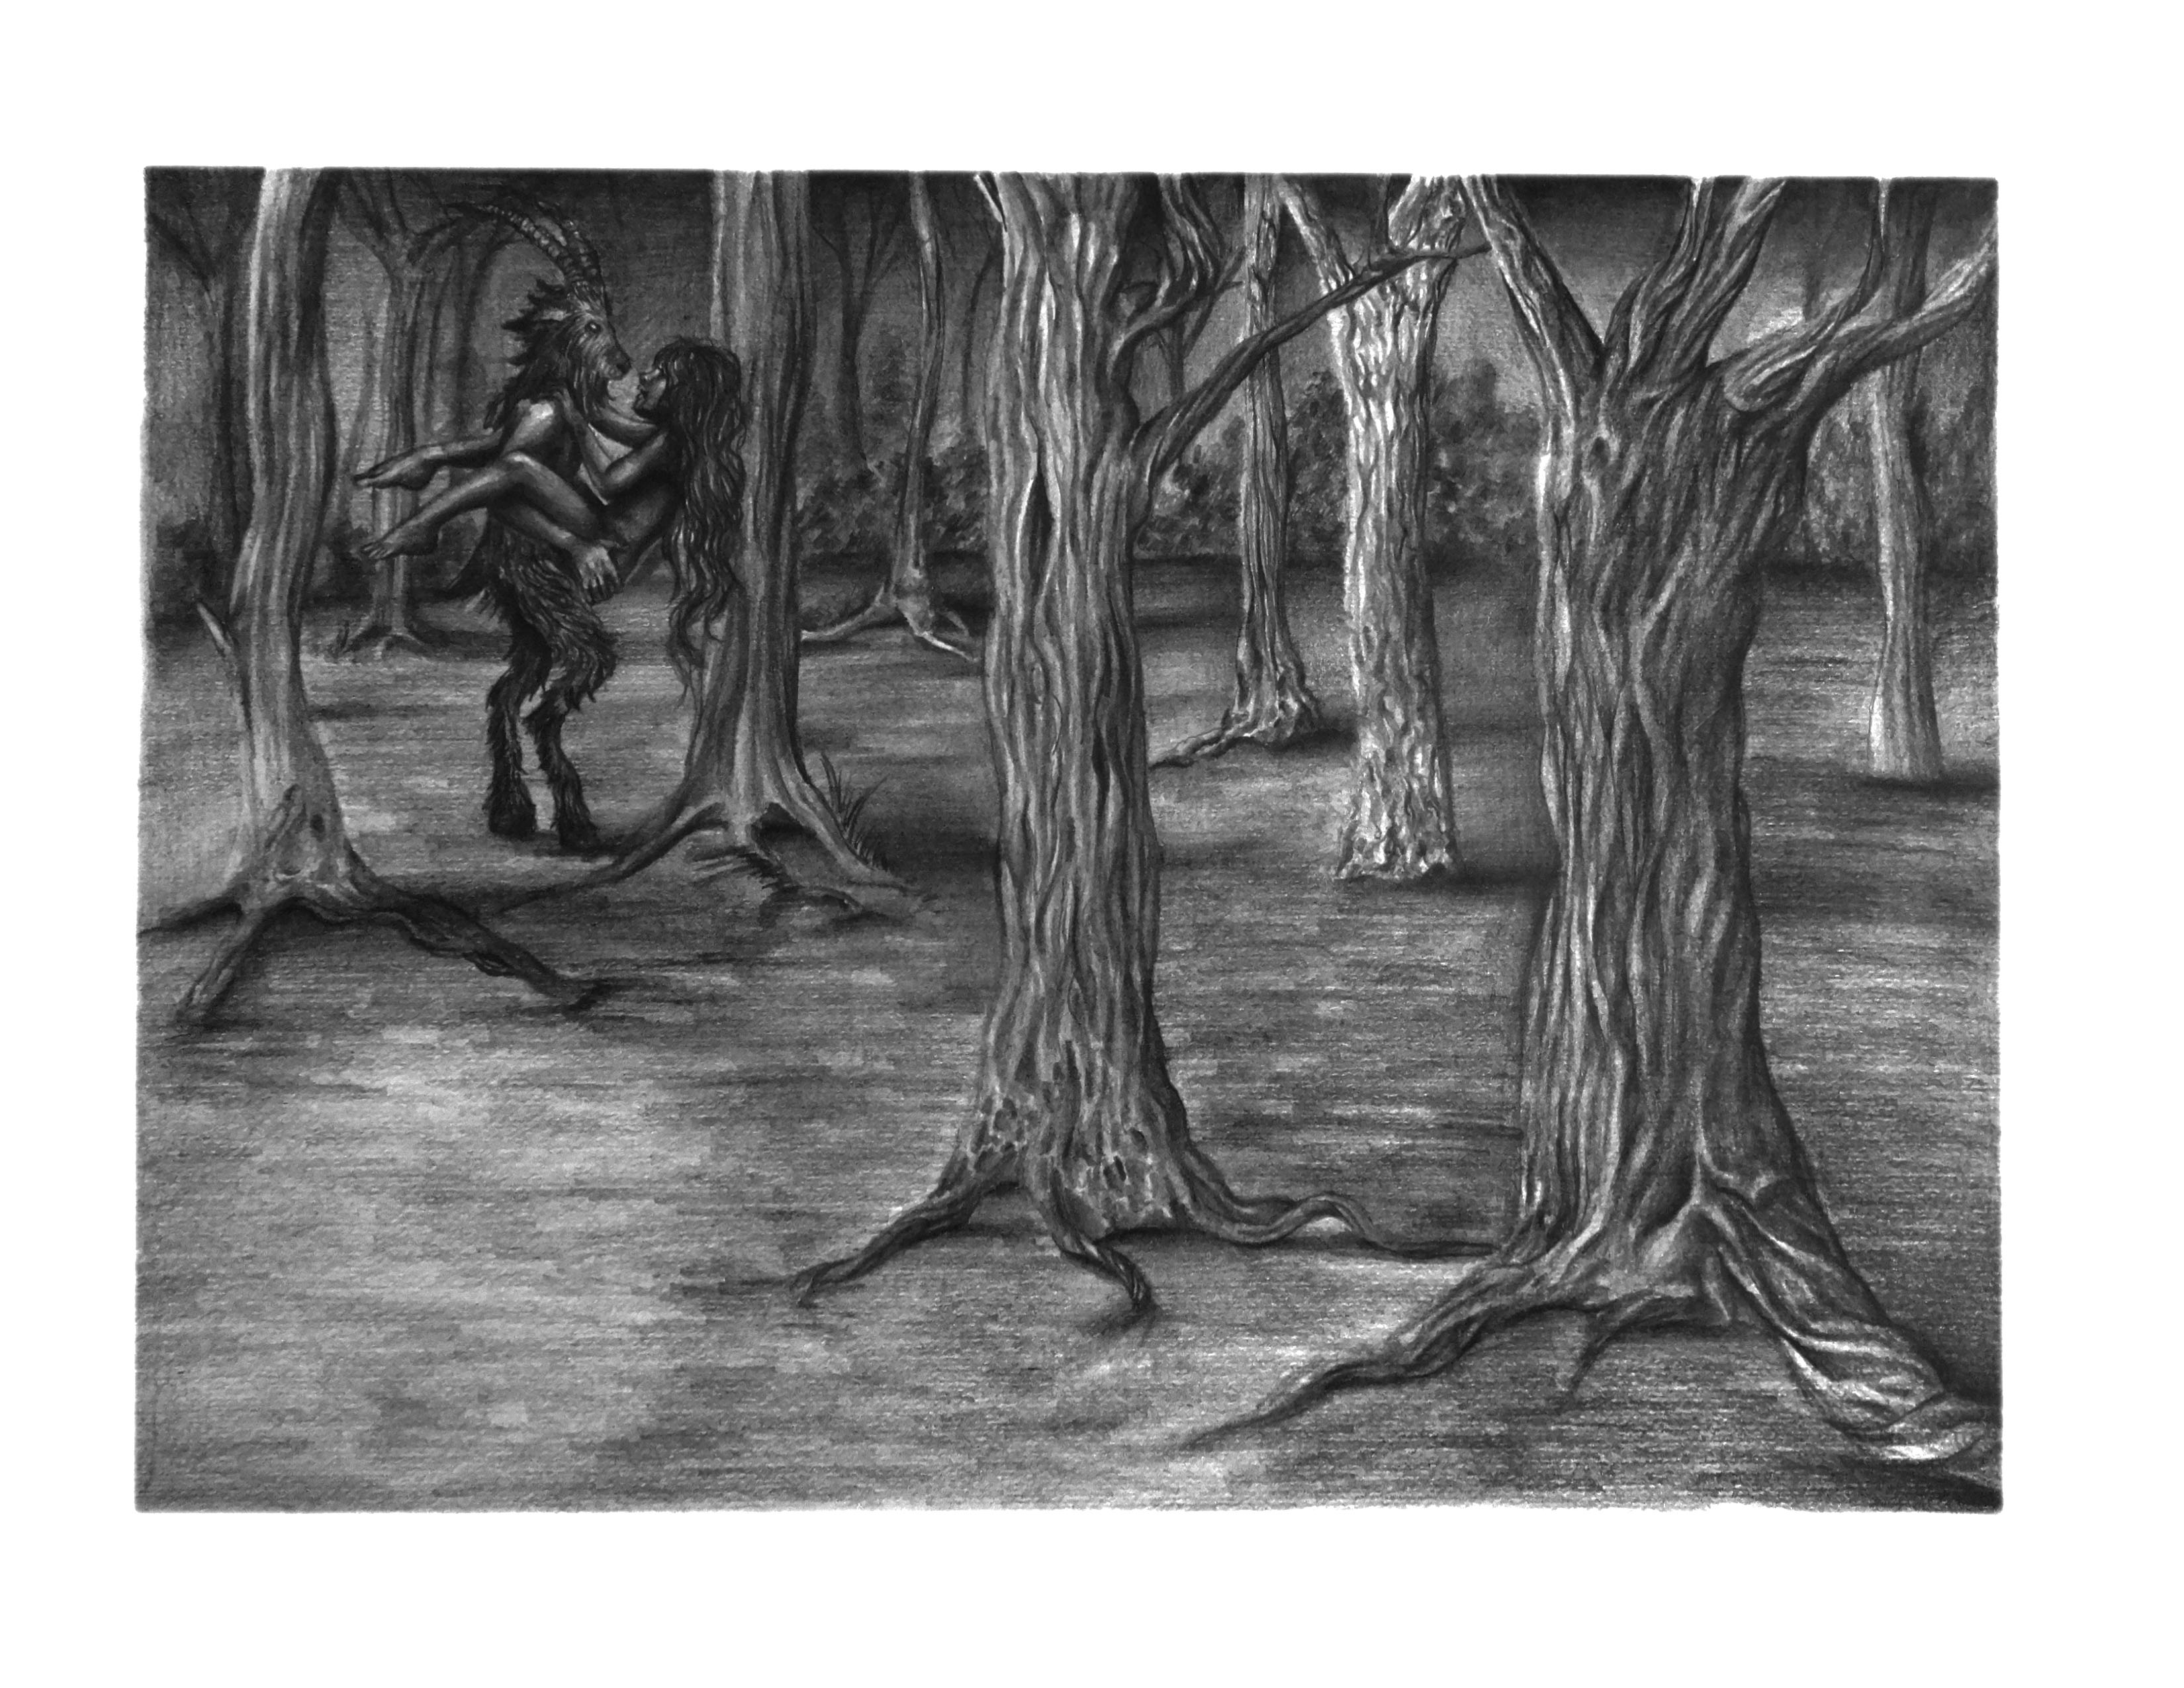 secretos del bosque (2019) - Kamila Sutcliff